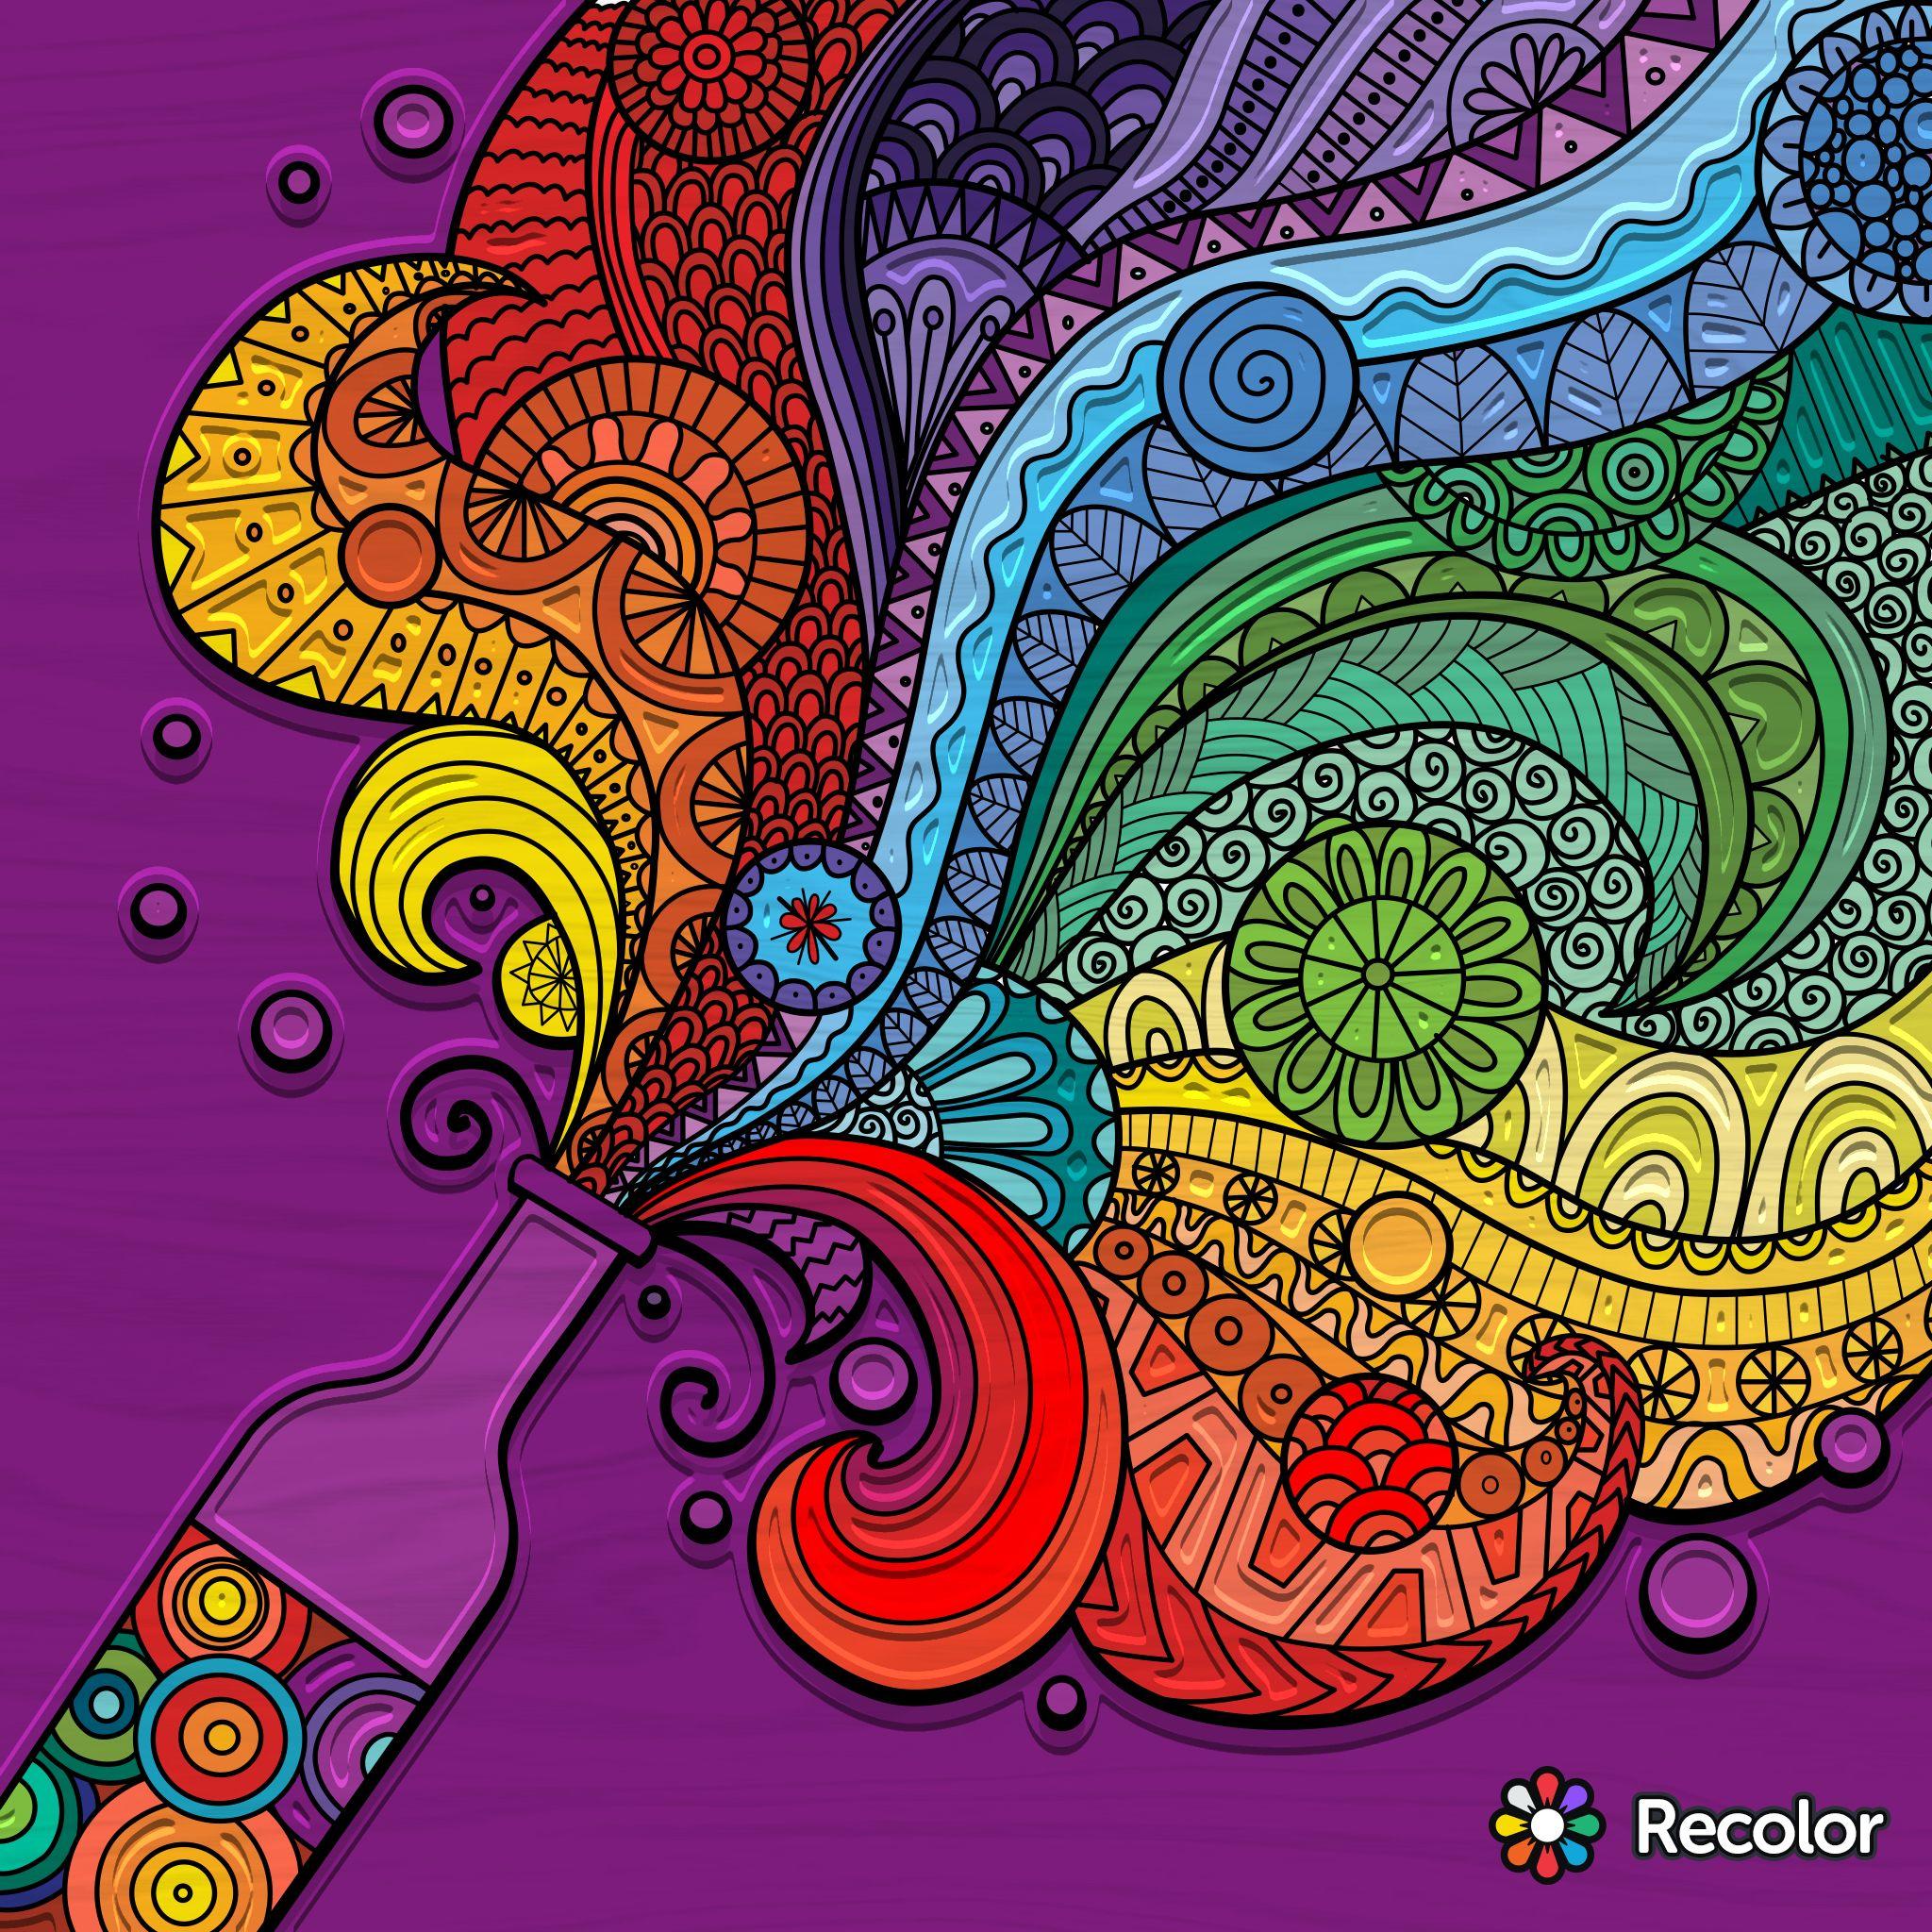 exoticcoloringbottle Zen art, Drawings, Art